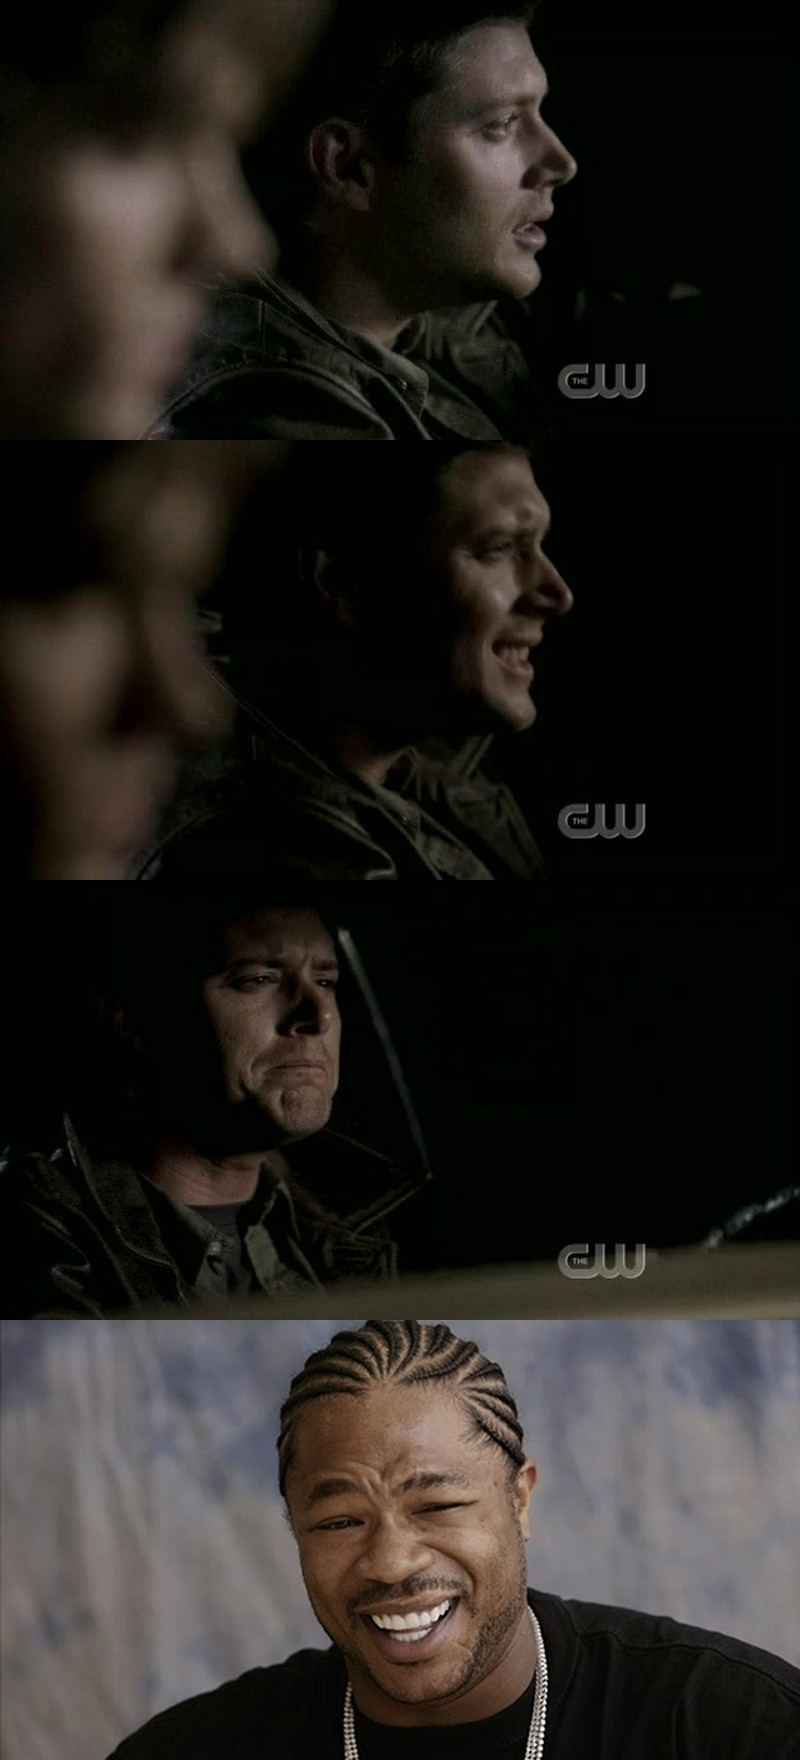 Dean singing... 😂😂😂